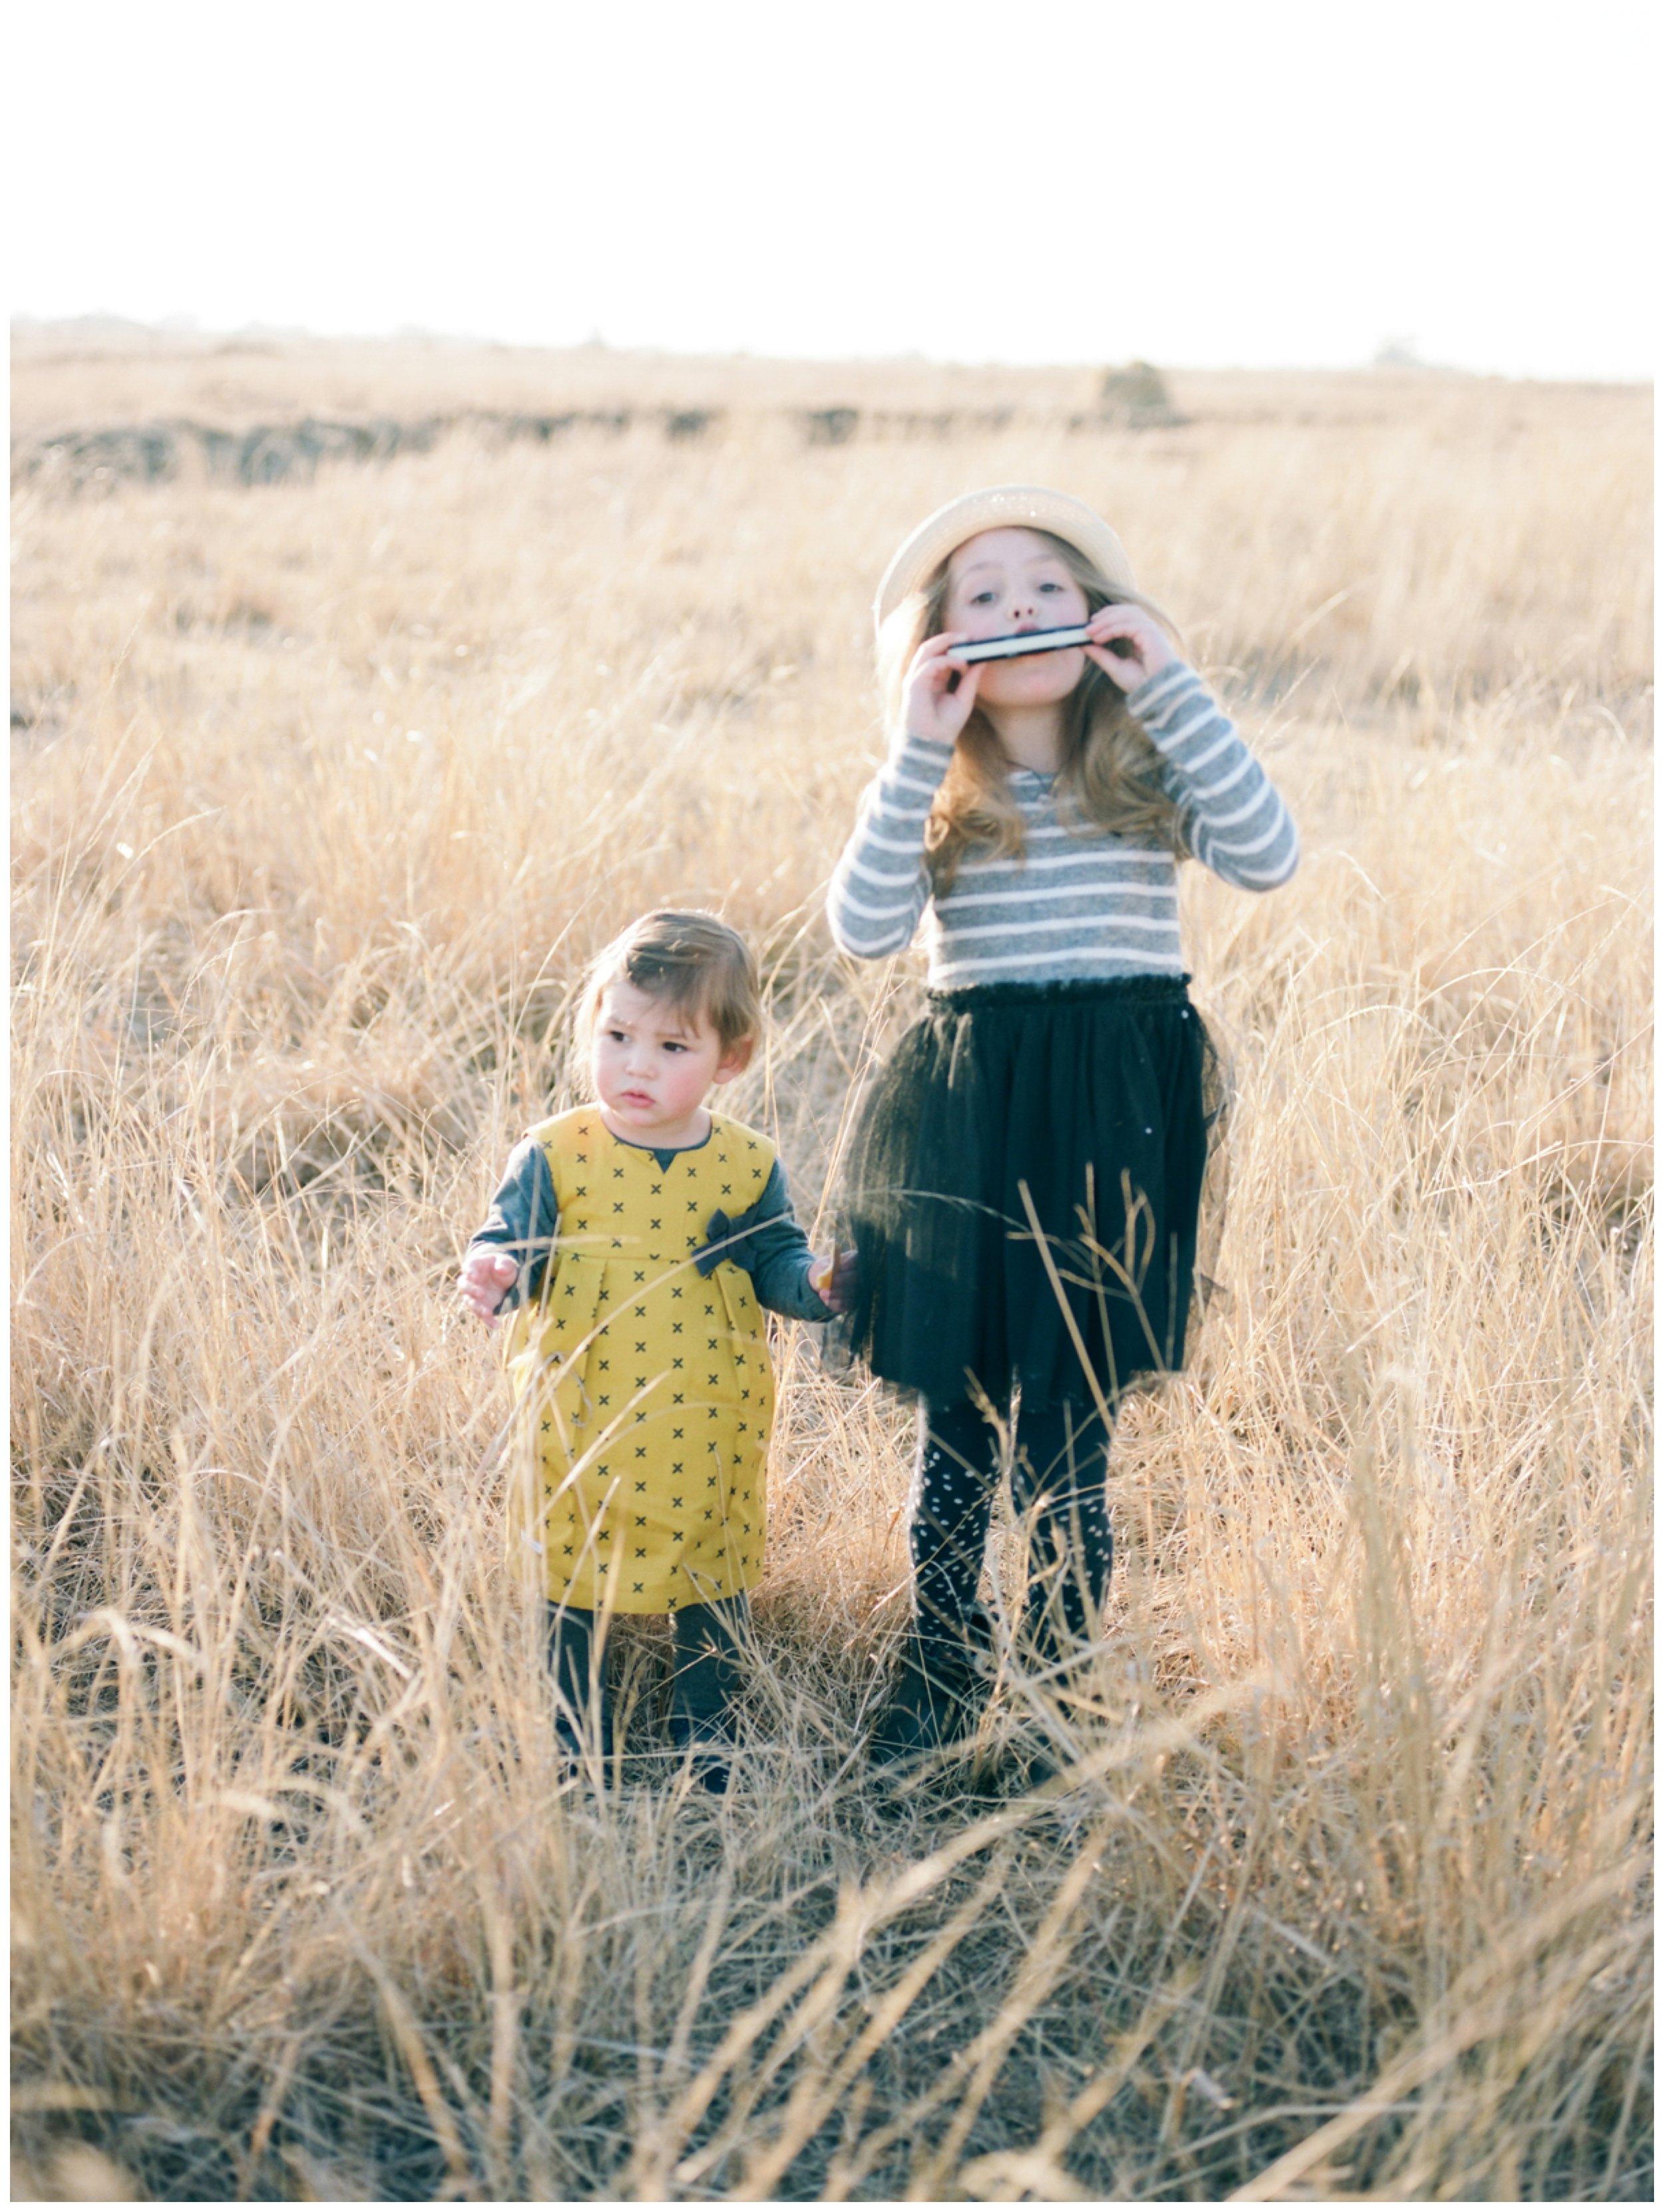 Farmlife - Analog Shoot with my Kids